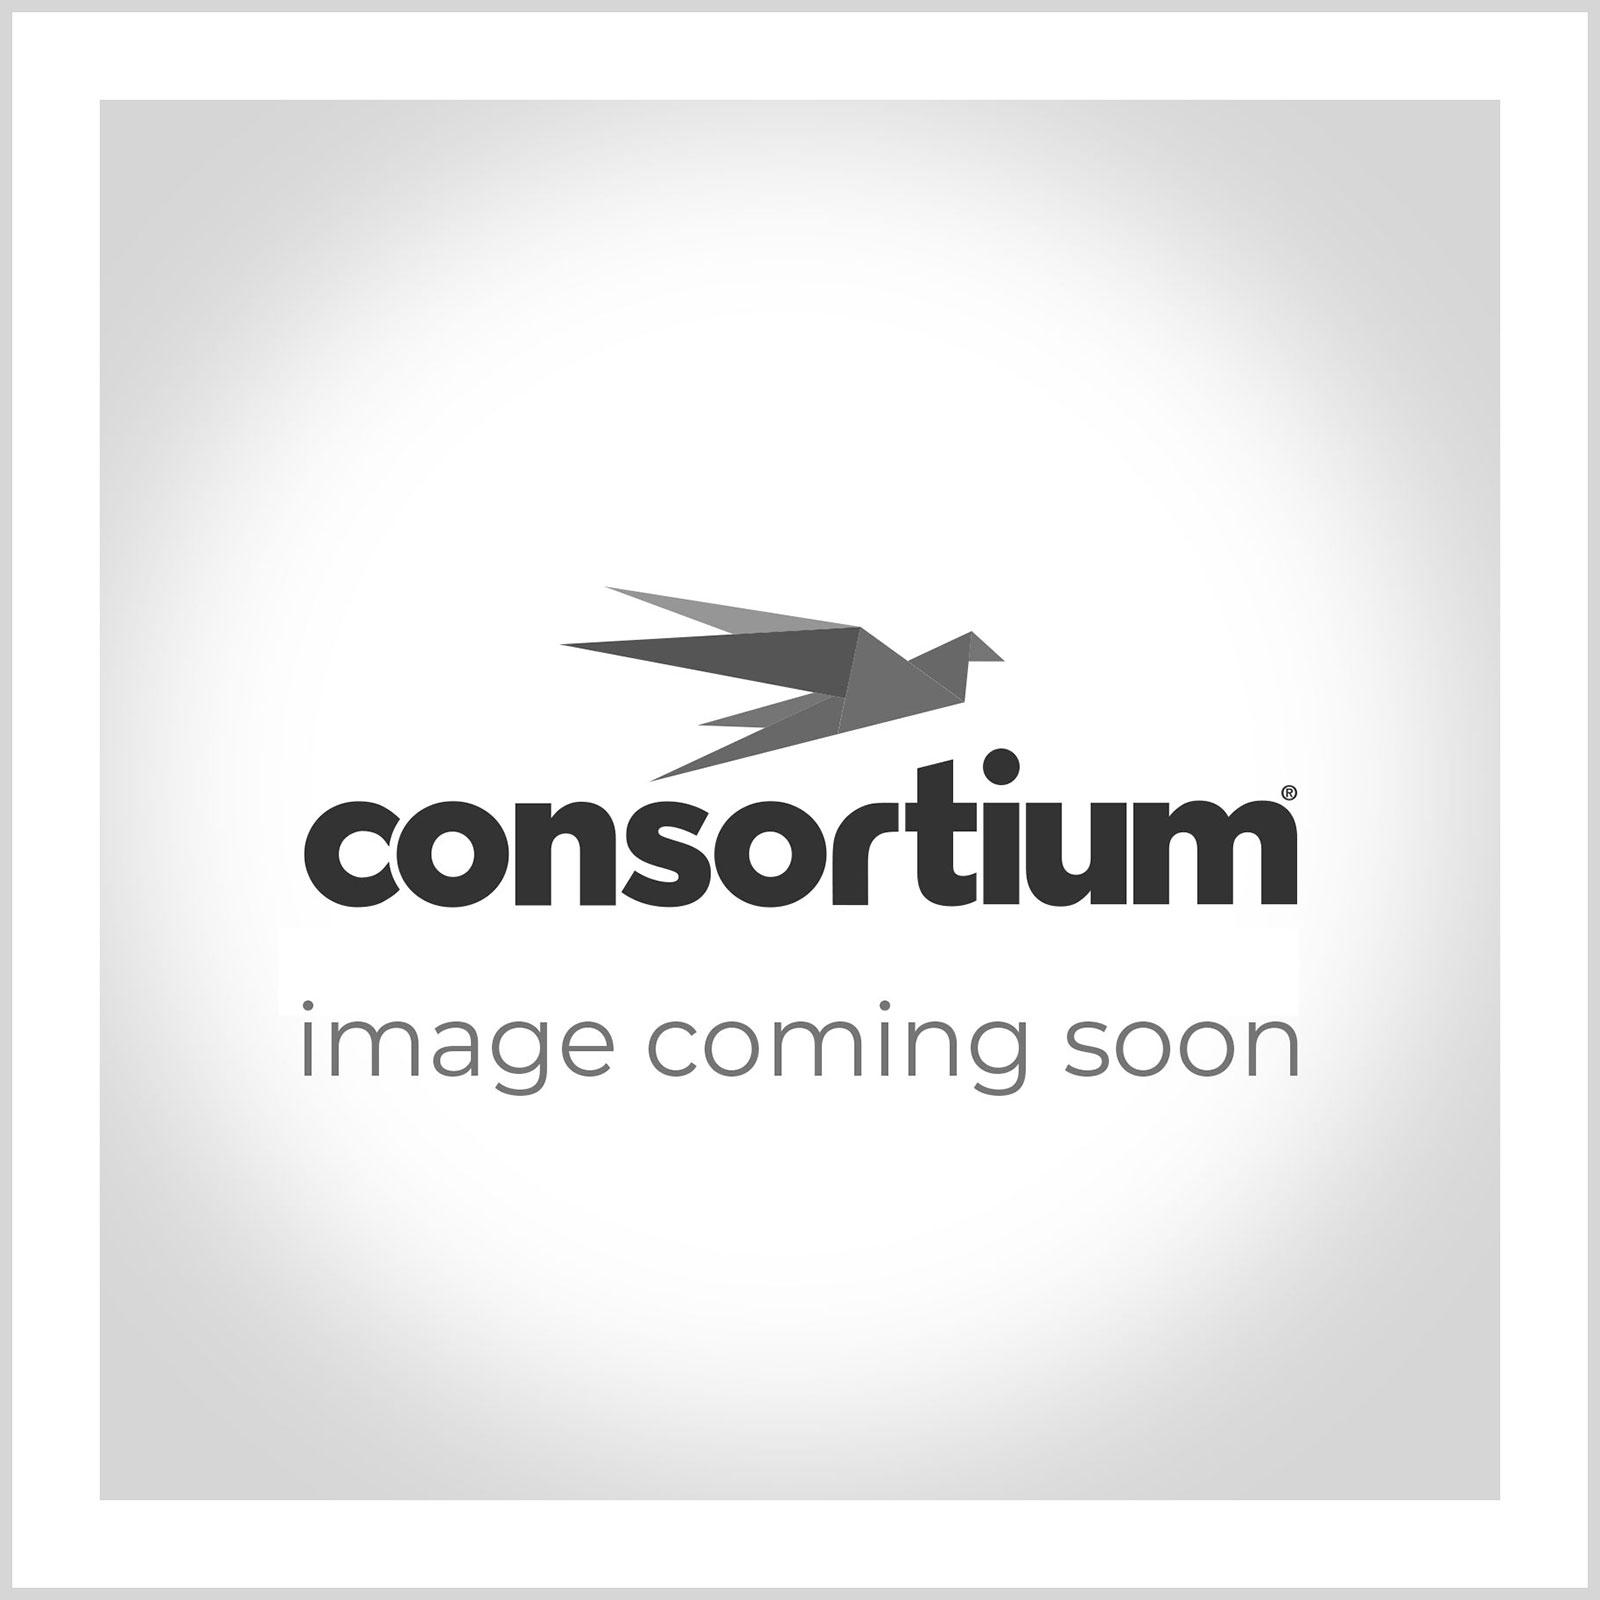 Sponge Rubber Playballs